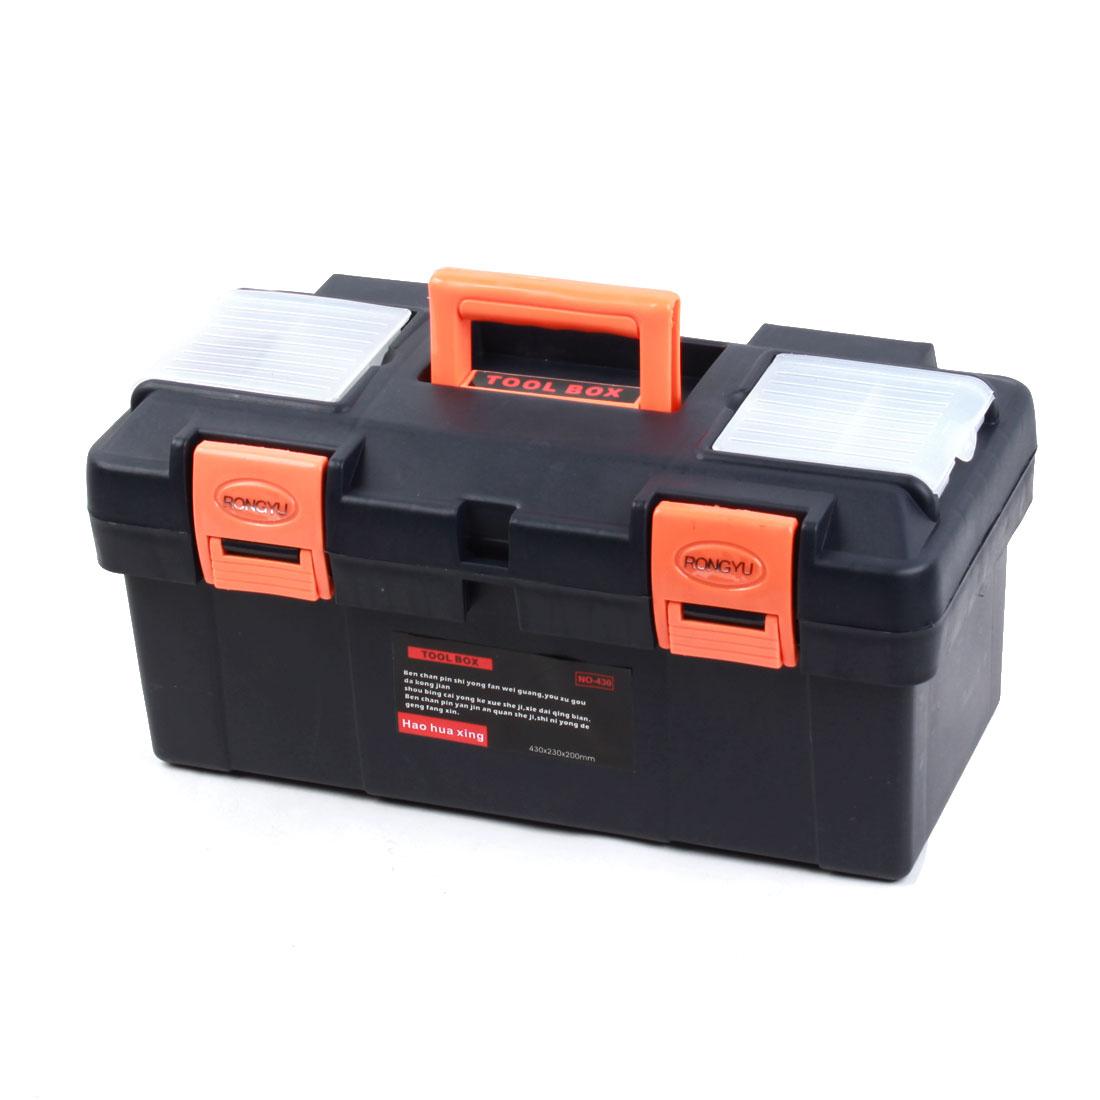 Engineer Plastic 2 Layers Hardware Tool Storage Box Navy Blue Orange